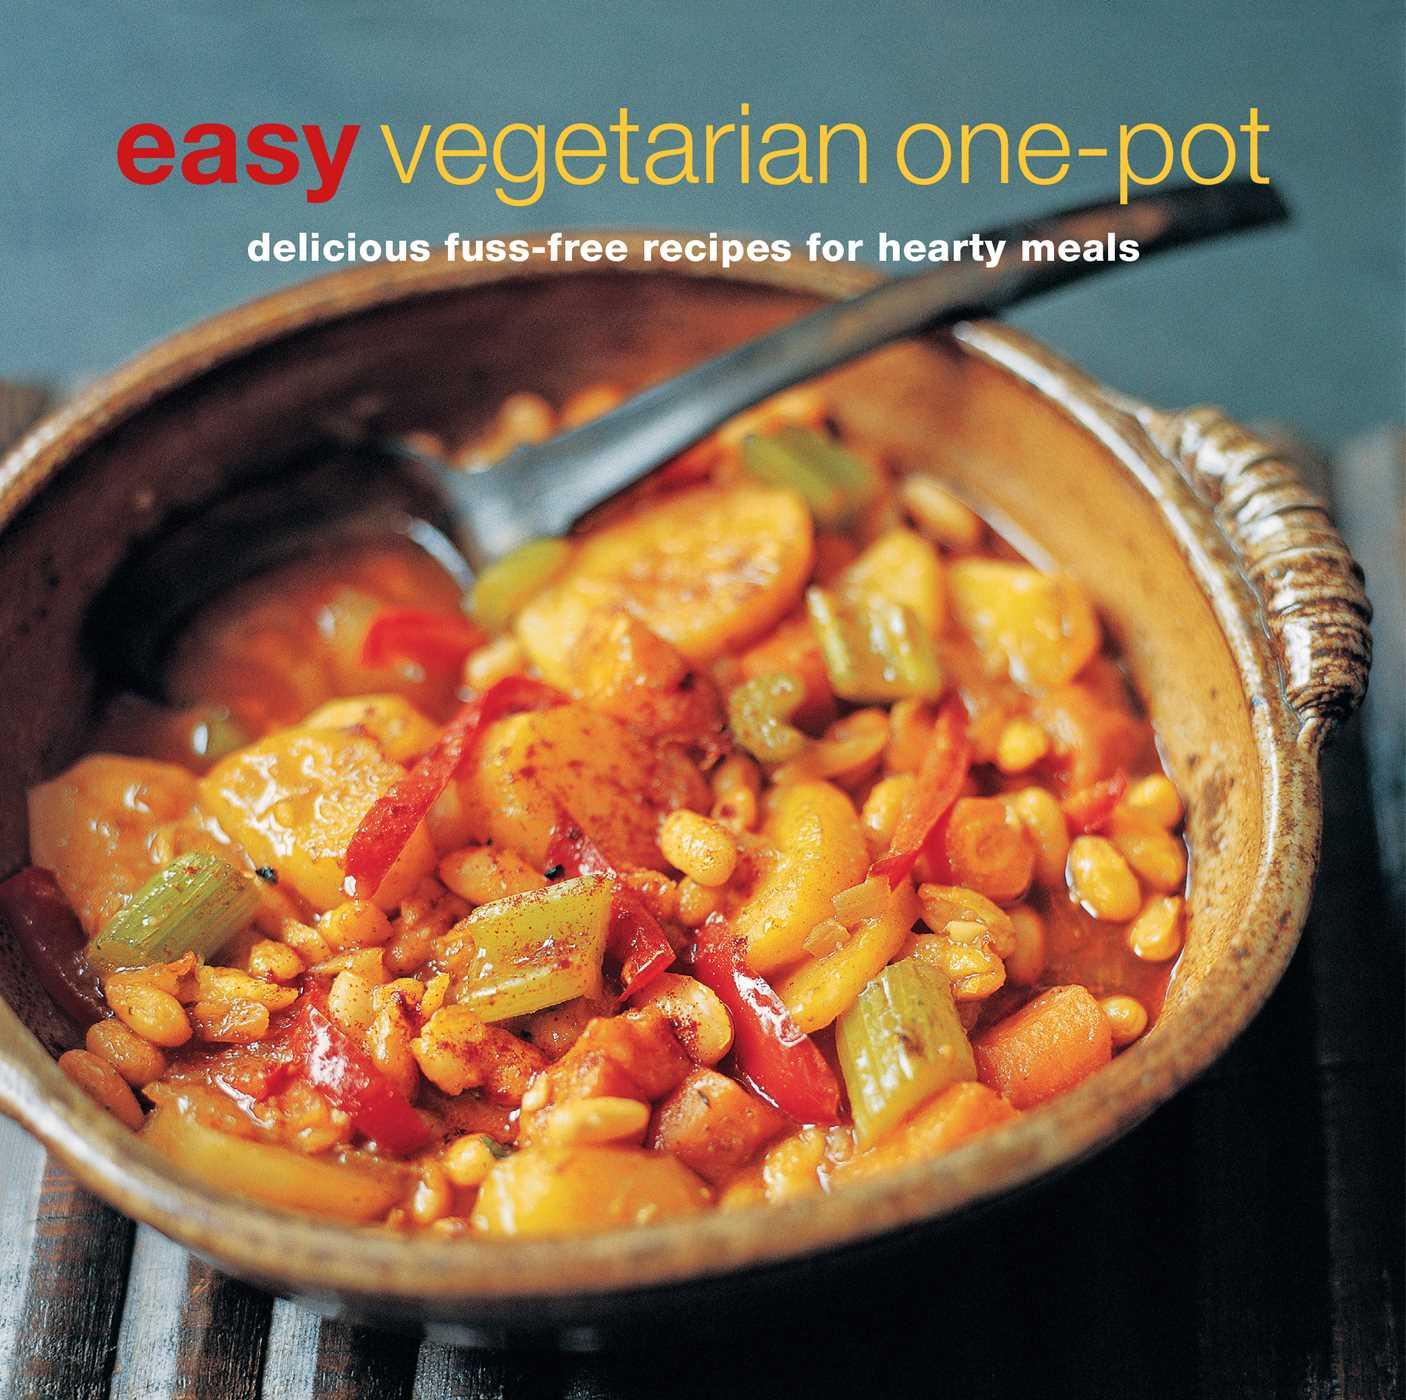 Easy vegetarian one pot 9781849751599 hr